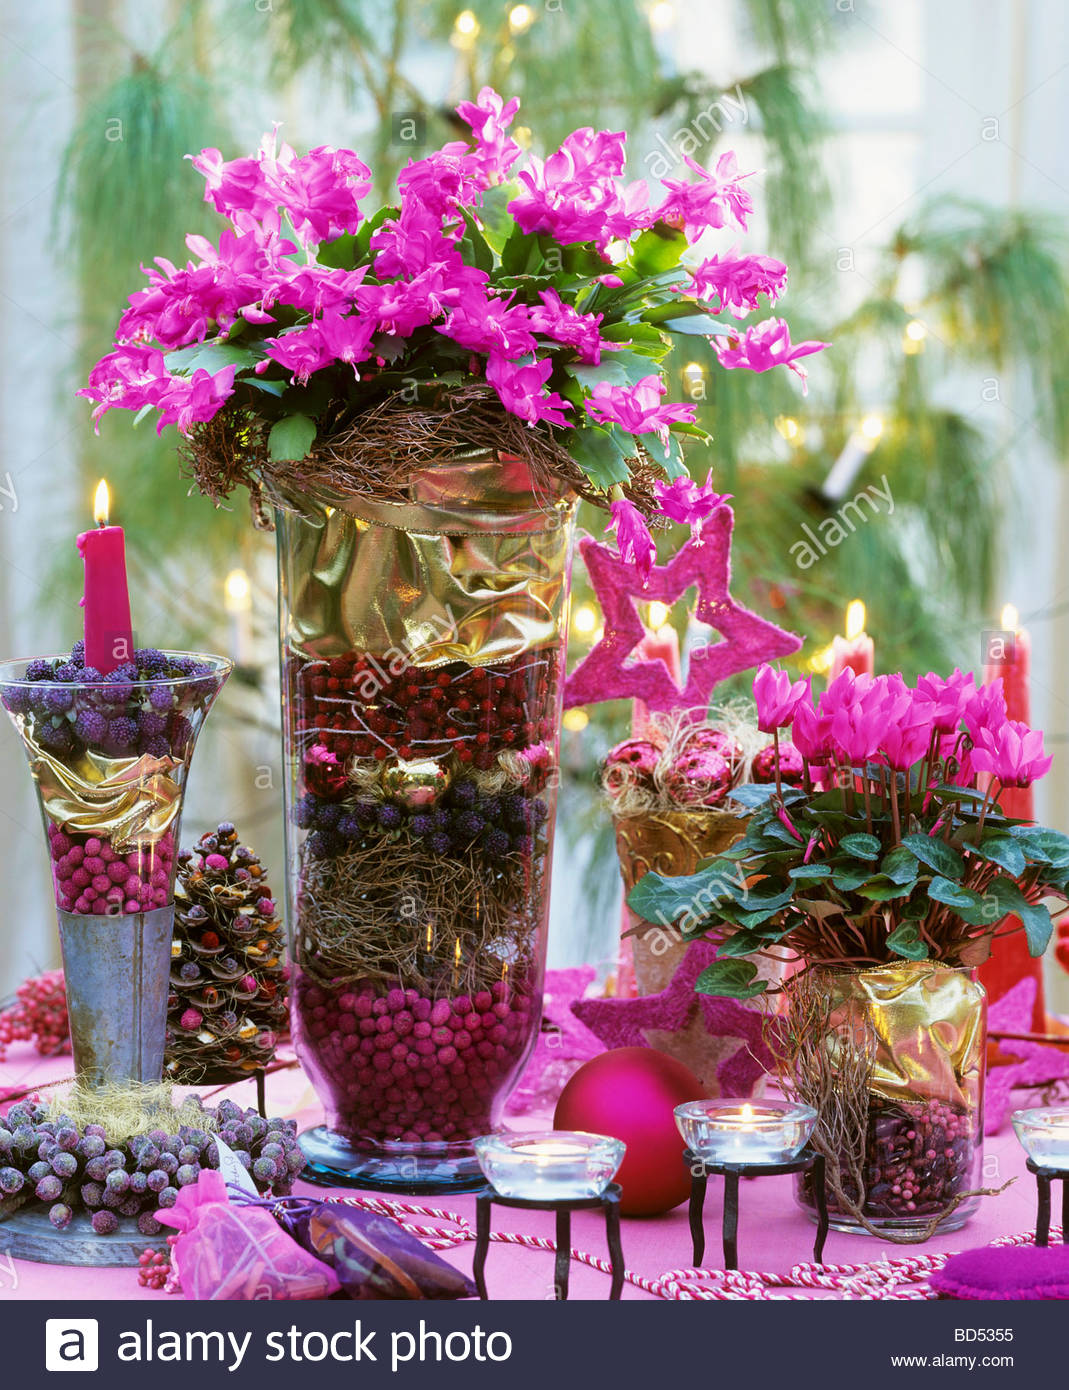 christmas cactus and cyclamen with christmas decorations stock image - Cactus Christmas Decorations